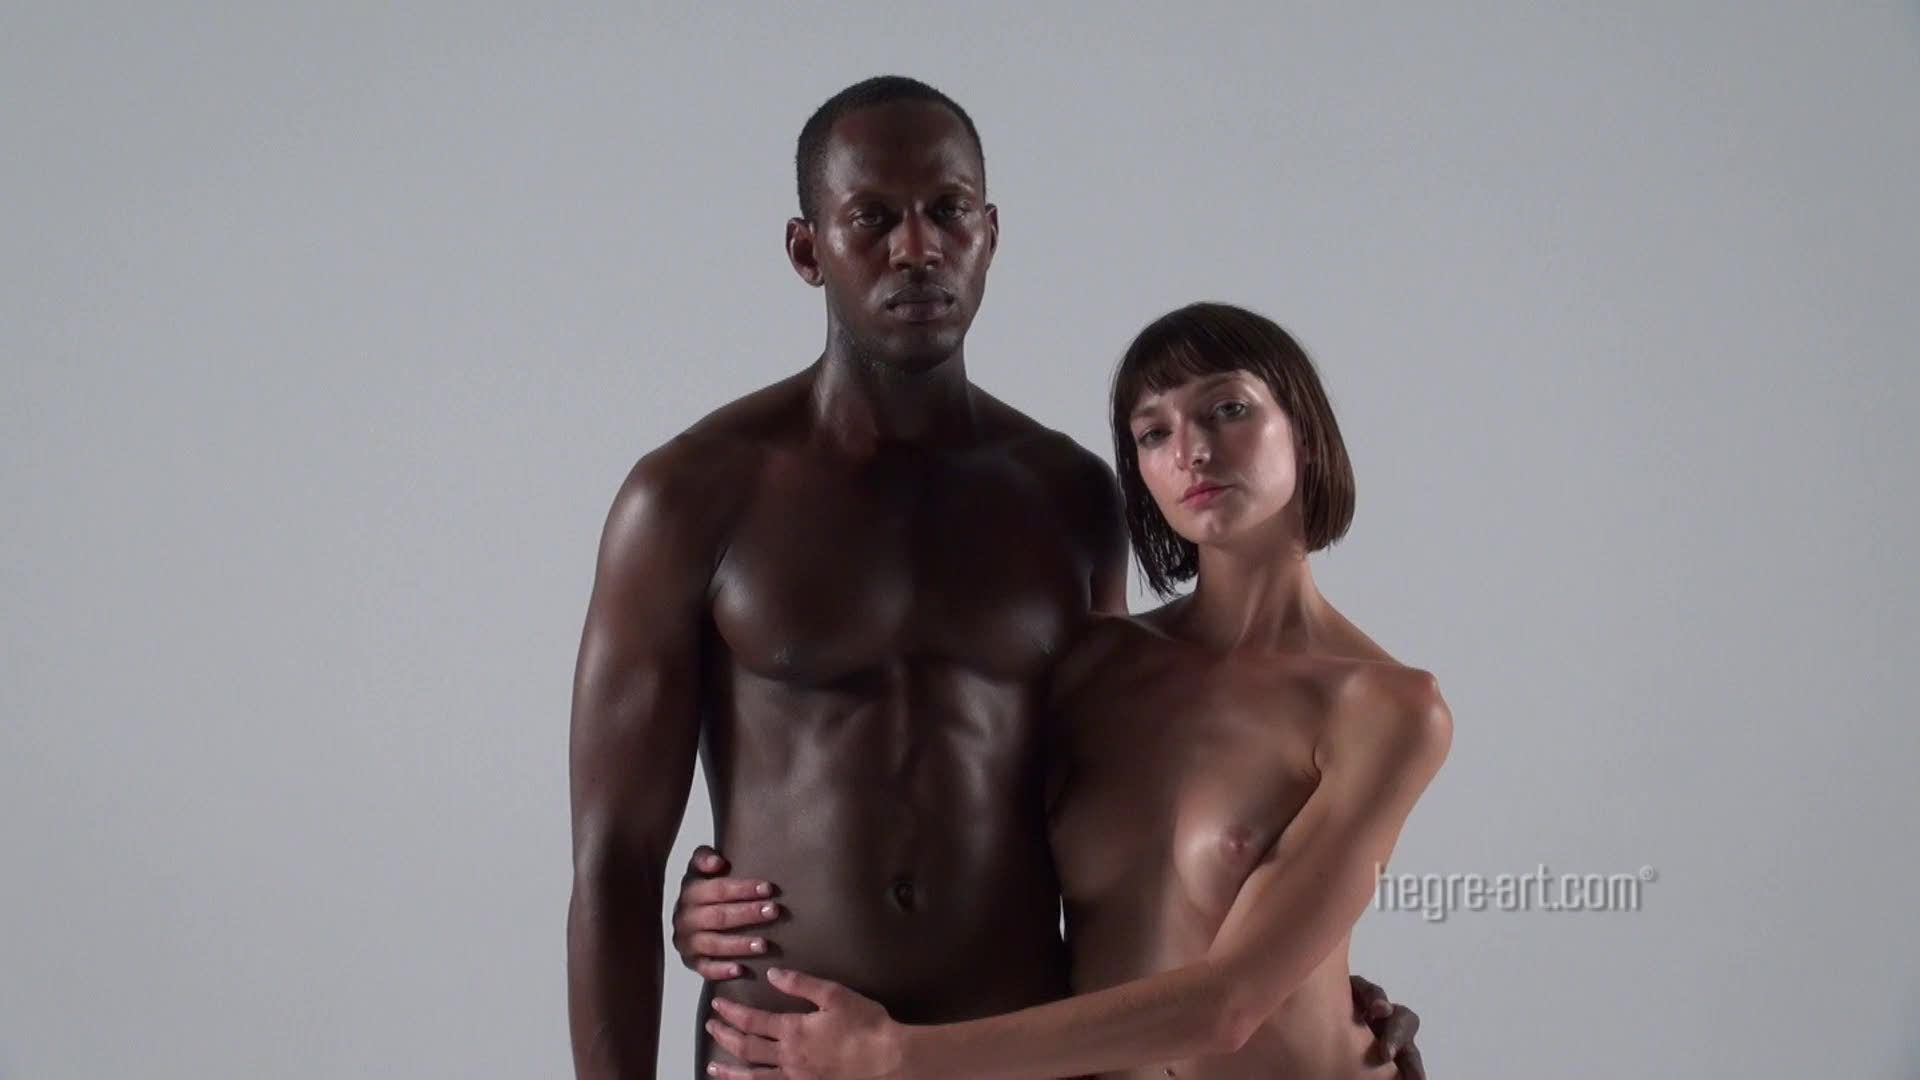 материалы эротика негры с белыми девушками мужичек